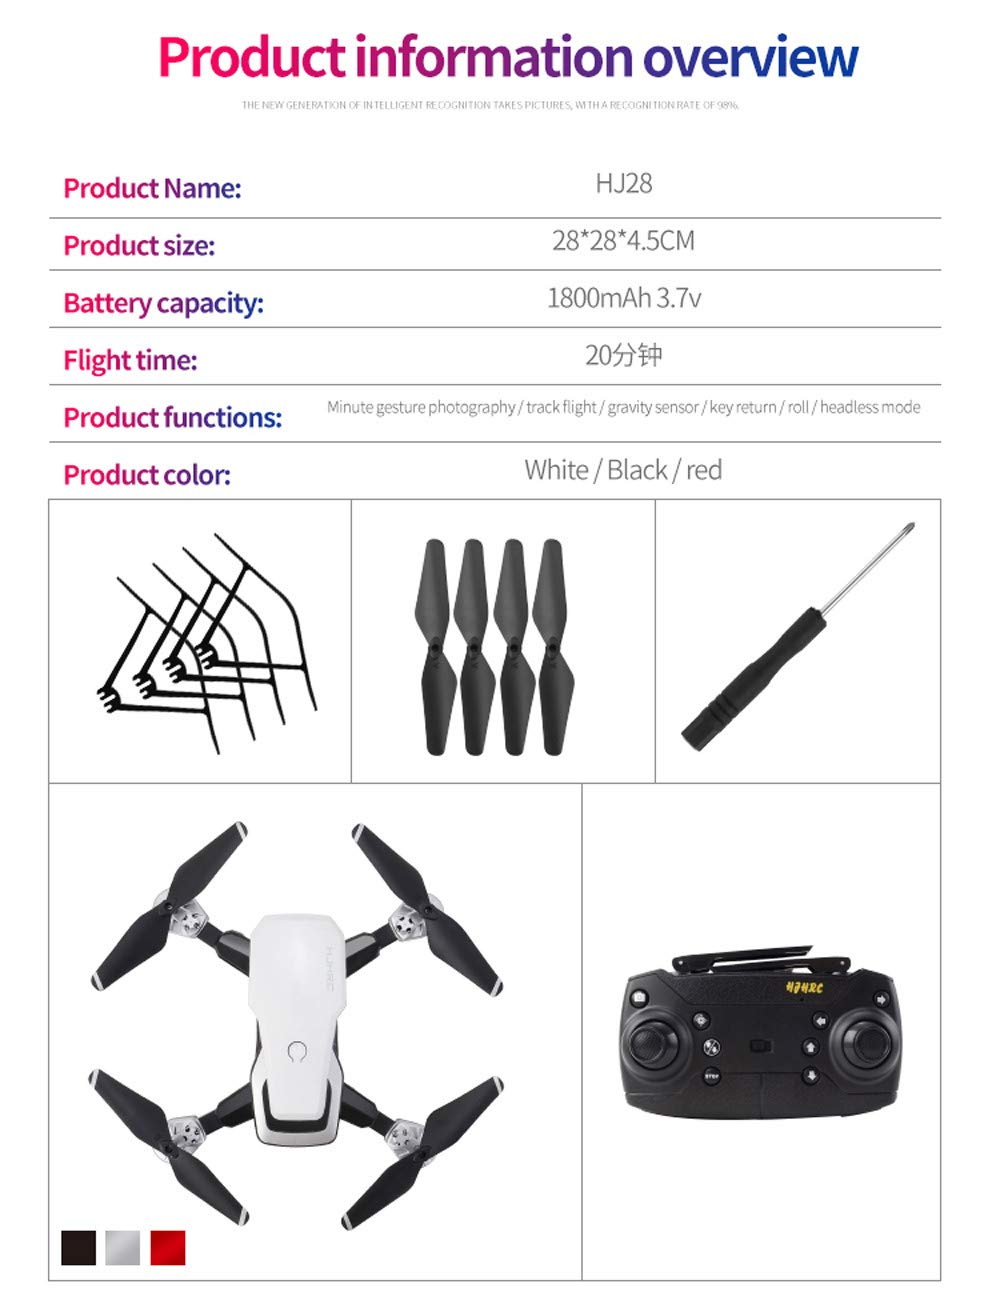 Fcostume RC Drohne, HJ28 5.0MP 1080 P Kamera WiFi WiFi WiFi FPV Faltbare 6-Achsen-Gyro RC Quadcopter Faltbare Drohne (Schwarz) c24c31